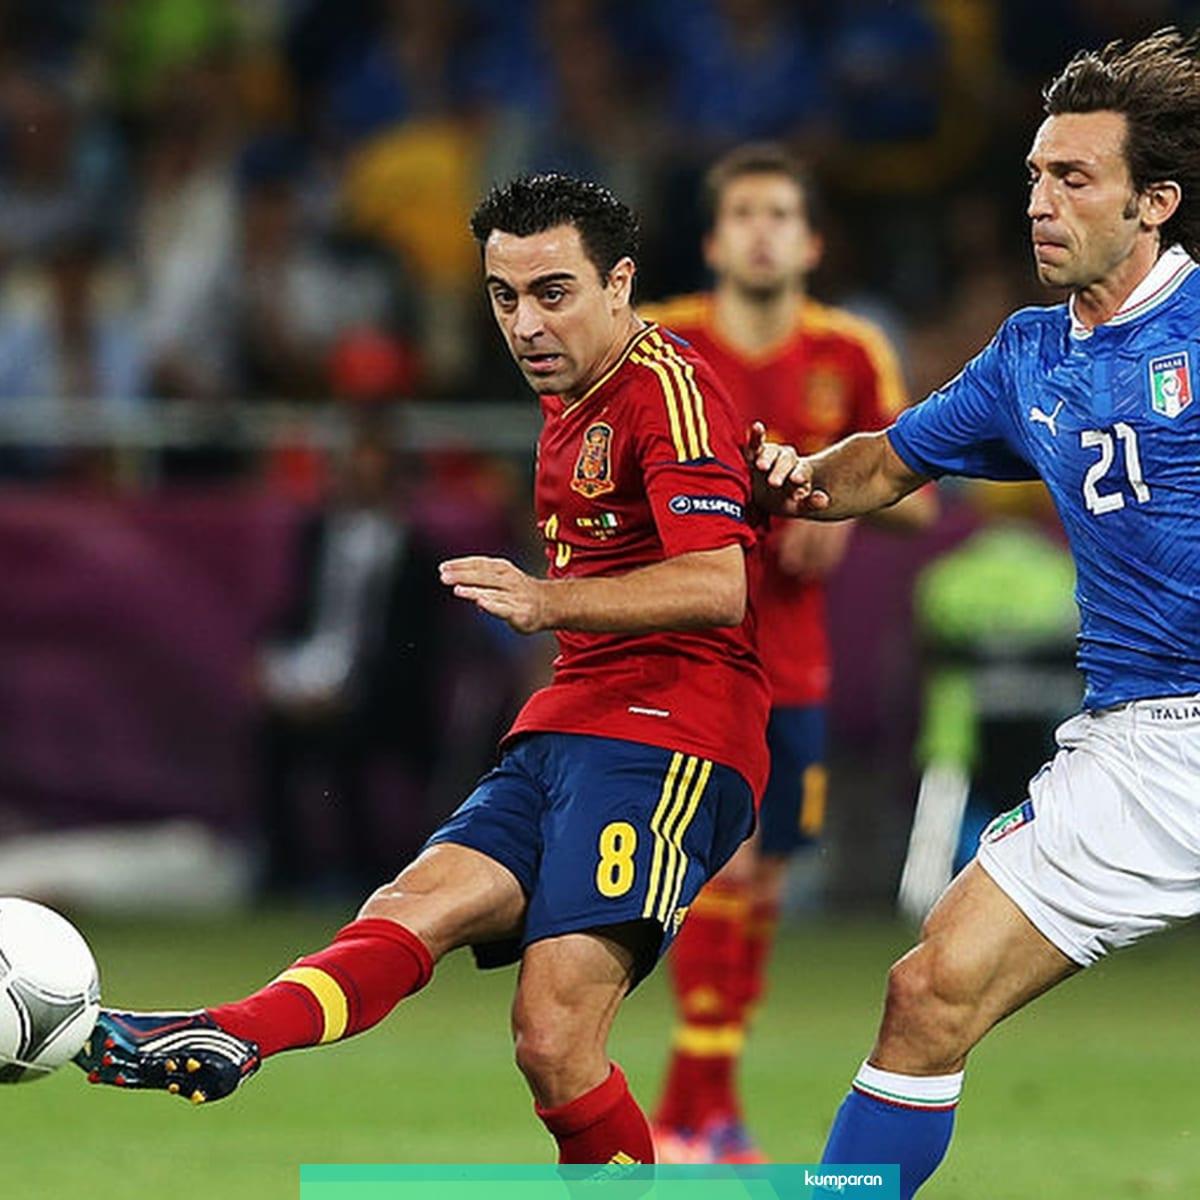 10 Partai Piala Eropa Yang Bisa Kamu Tonton Ulang Kumparan